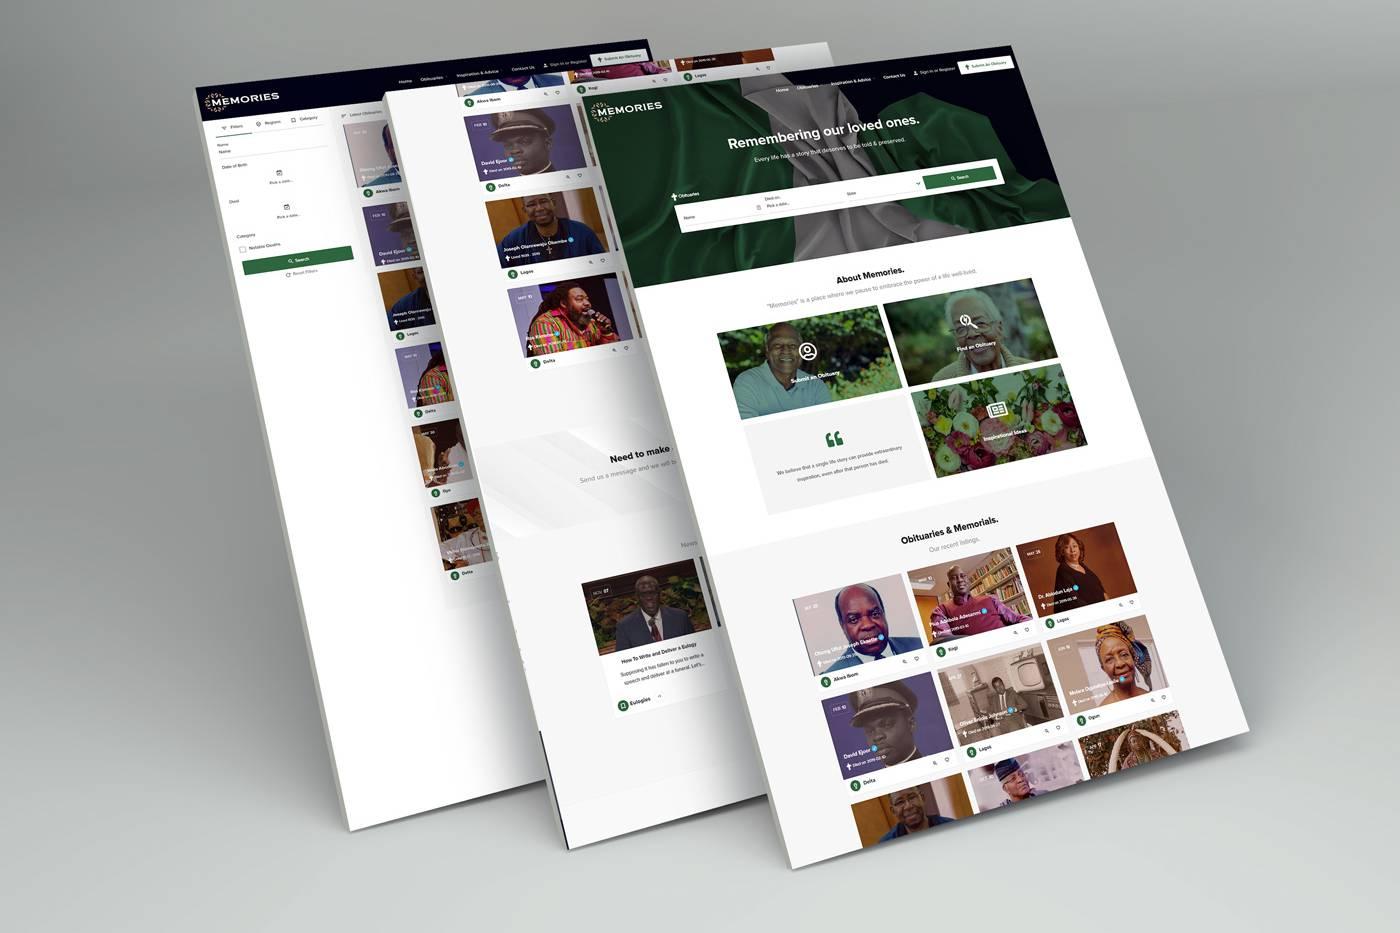 memories website for loved ones